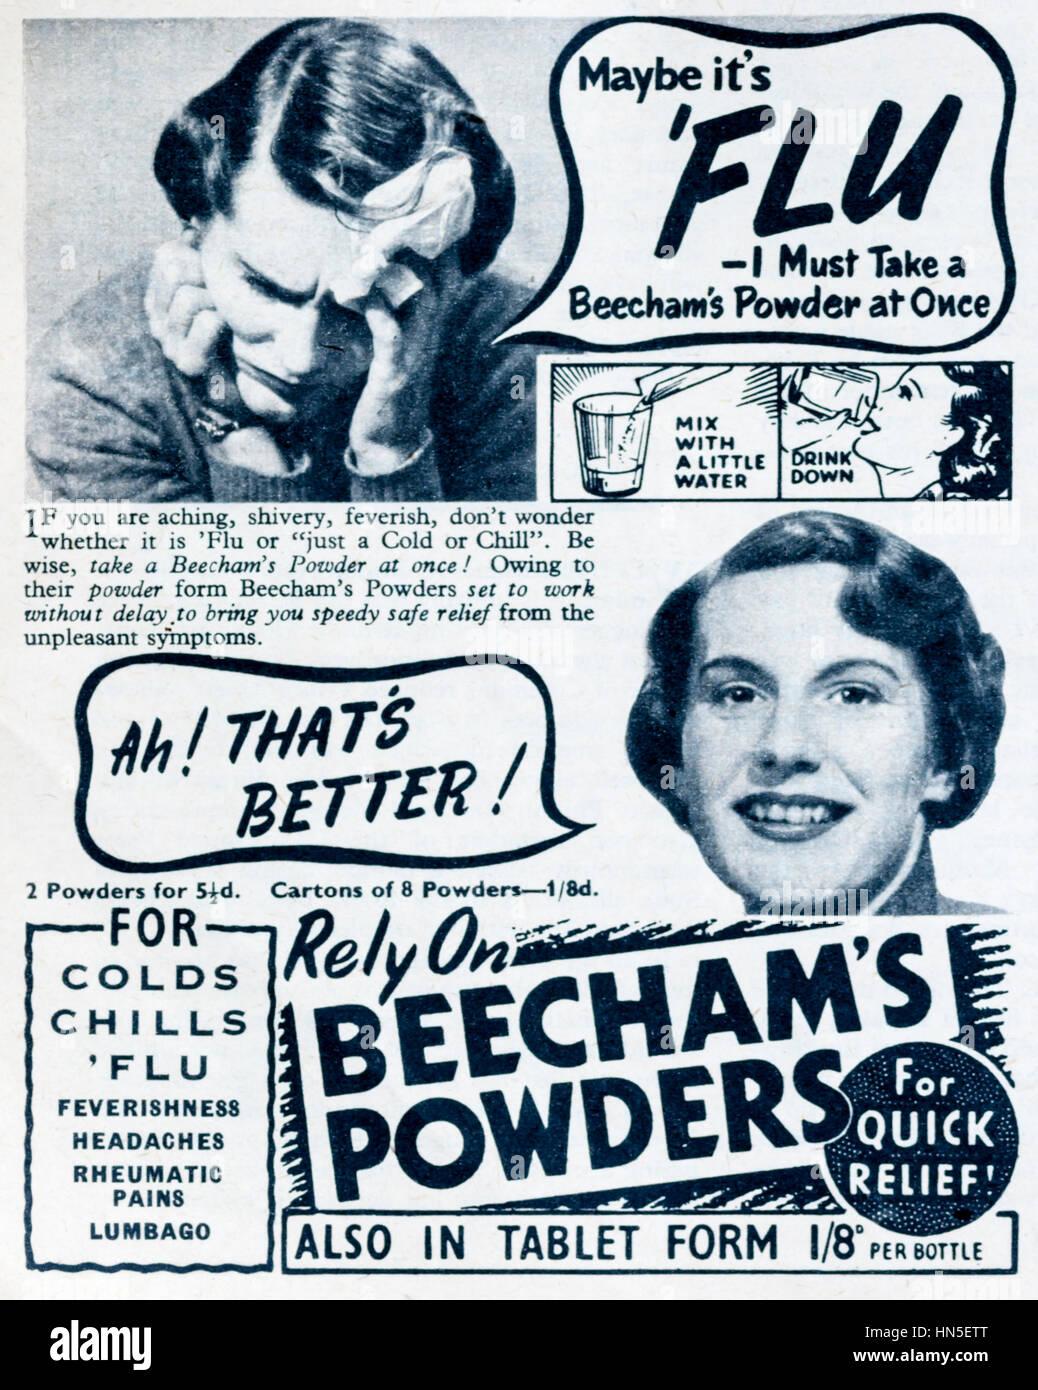 1950s magazine advertisement for Beecham's Powders. - Stock Image